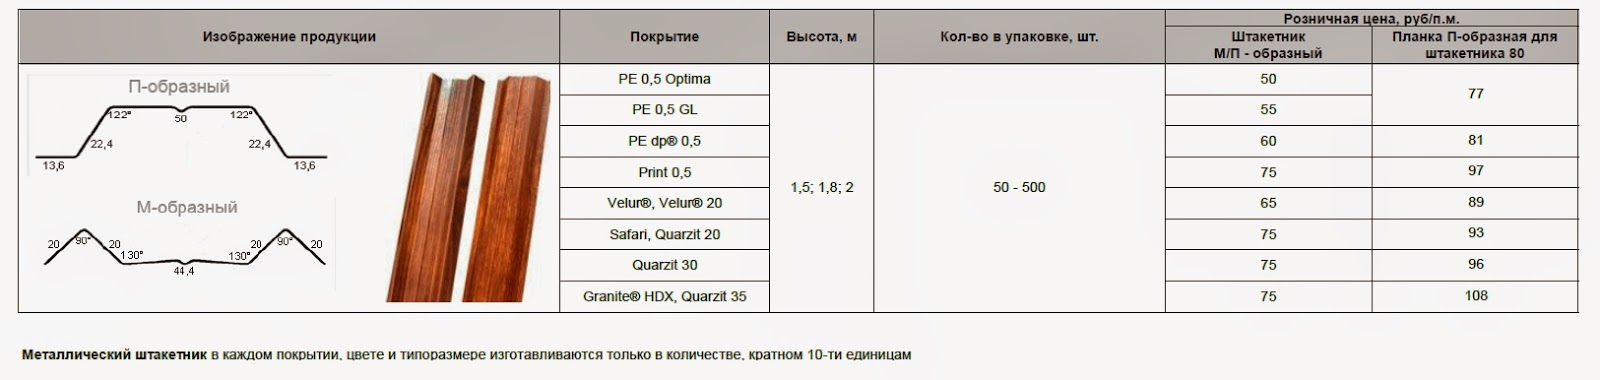 Цена металлического штакетника в Туле (2014)